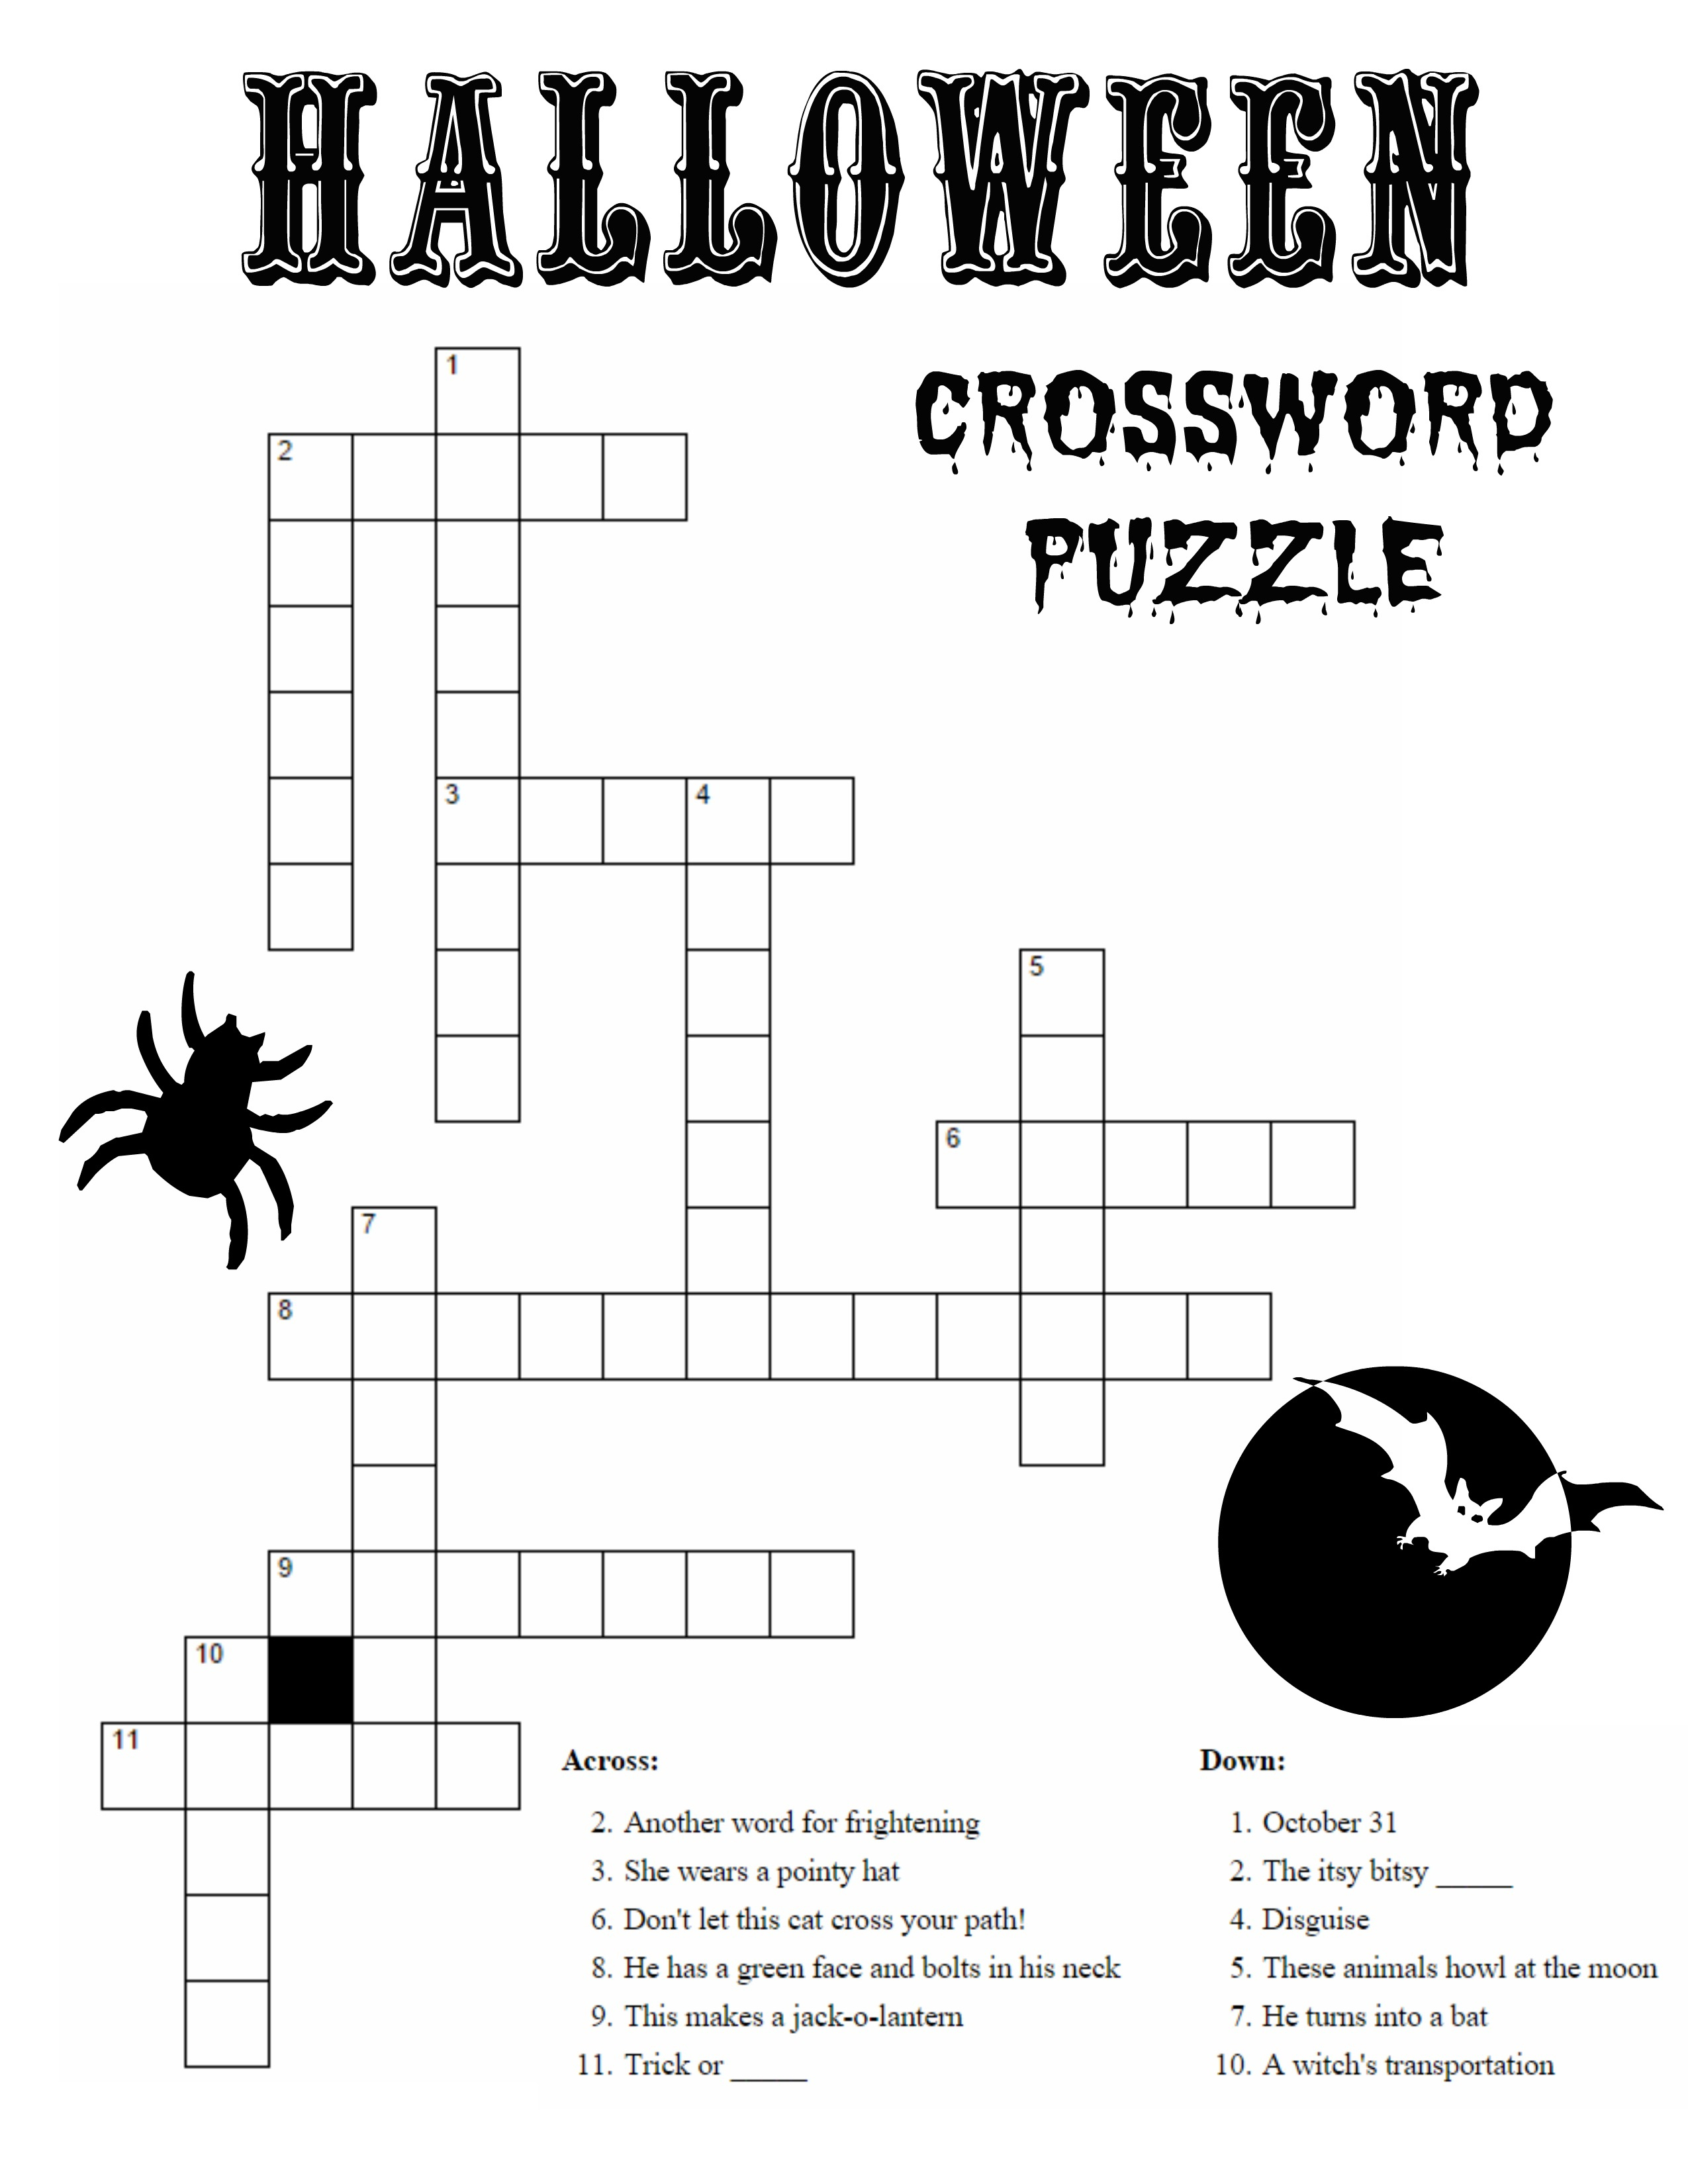 10 Best Photos Of Printable Halloween Word Puzzles - Halloween Word - Printable Crossword Puzzles Halloween